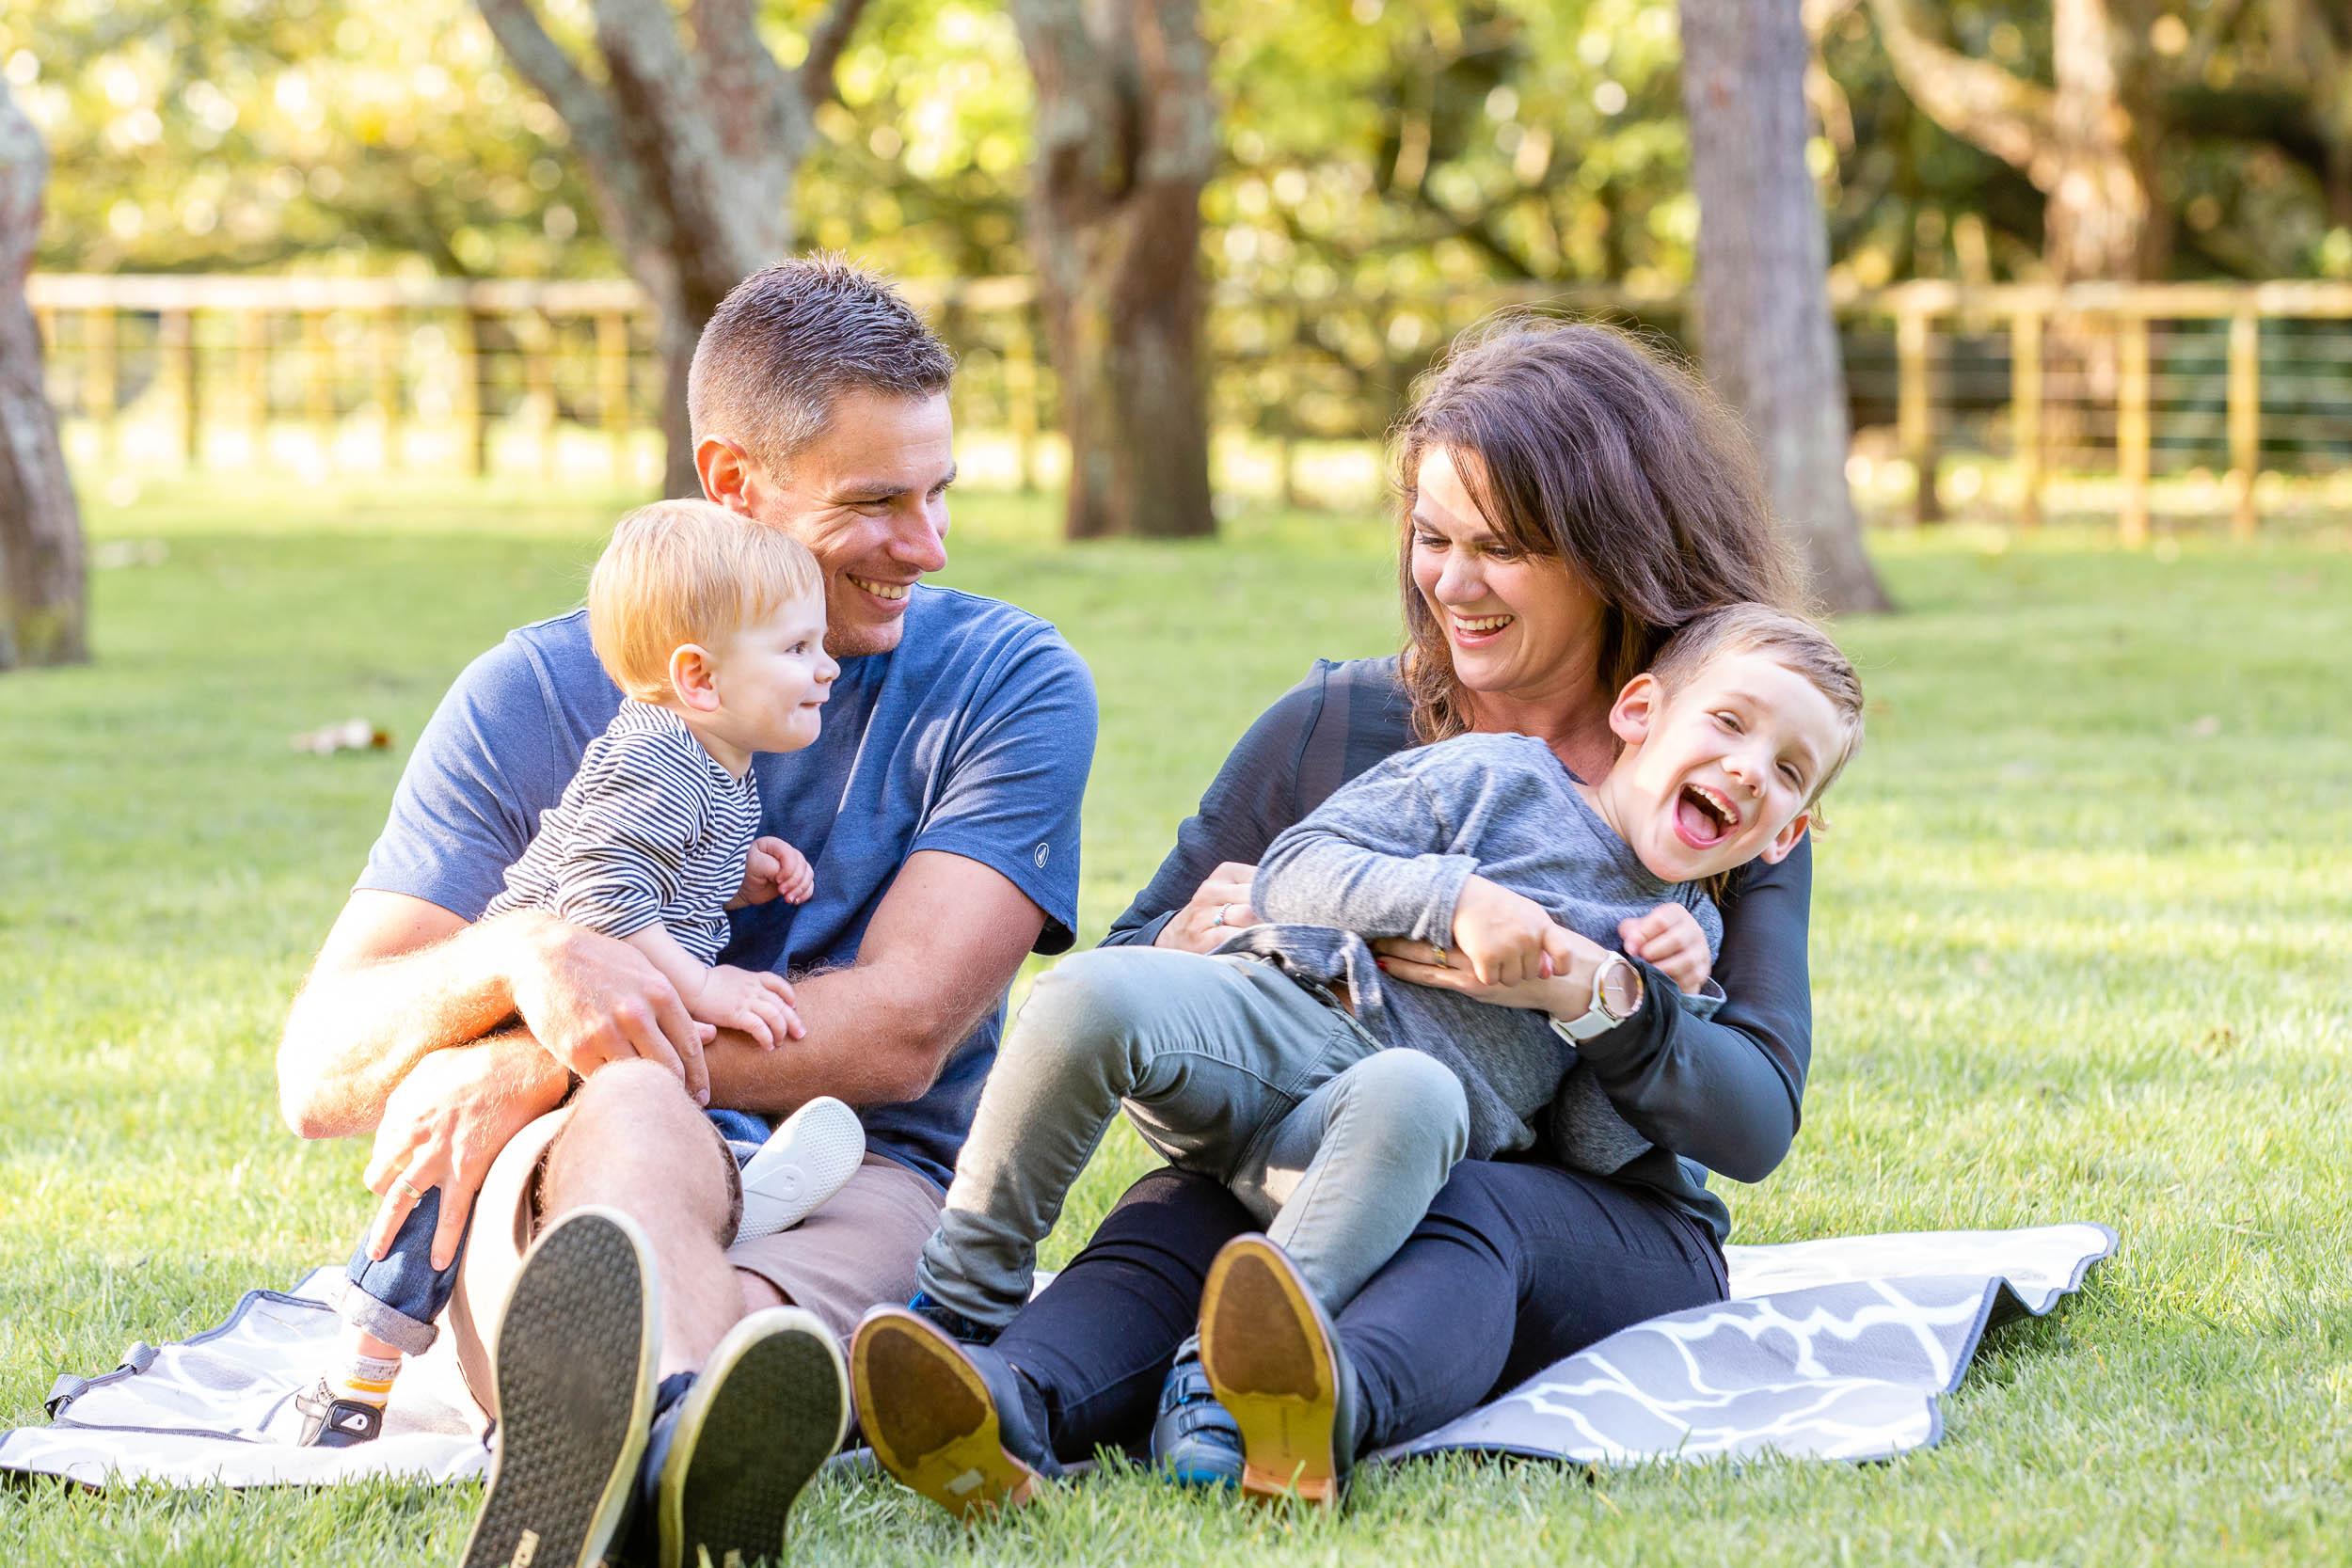 Aucklandfamilyphotographer (14 of 25).jpg